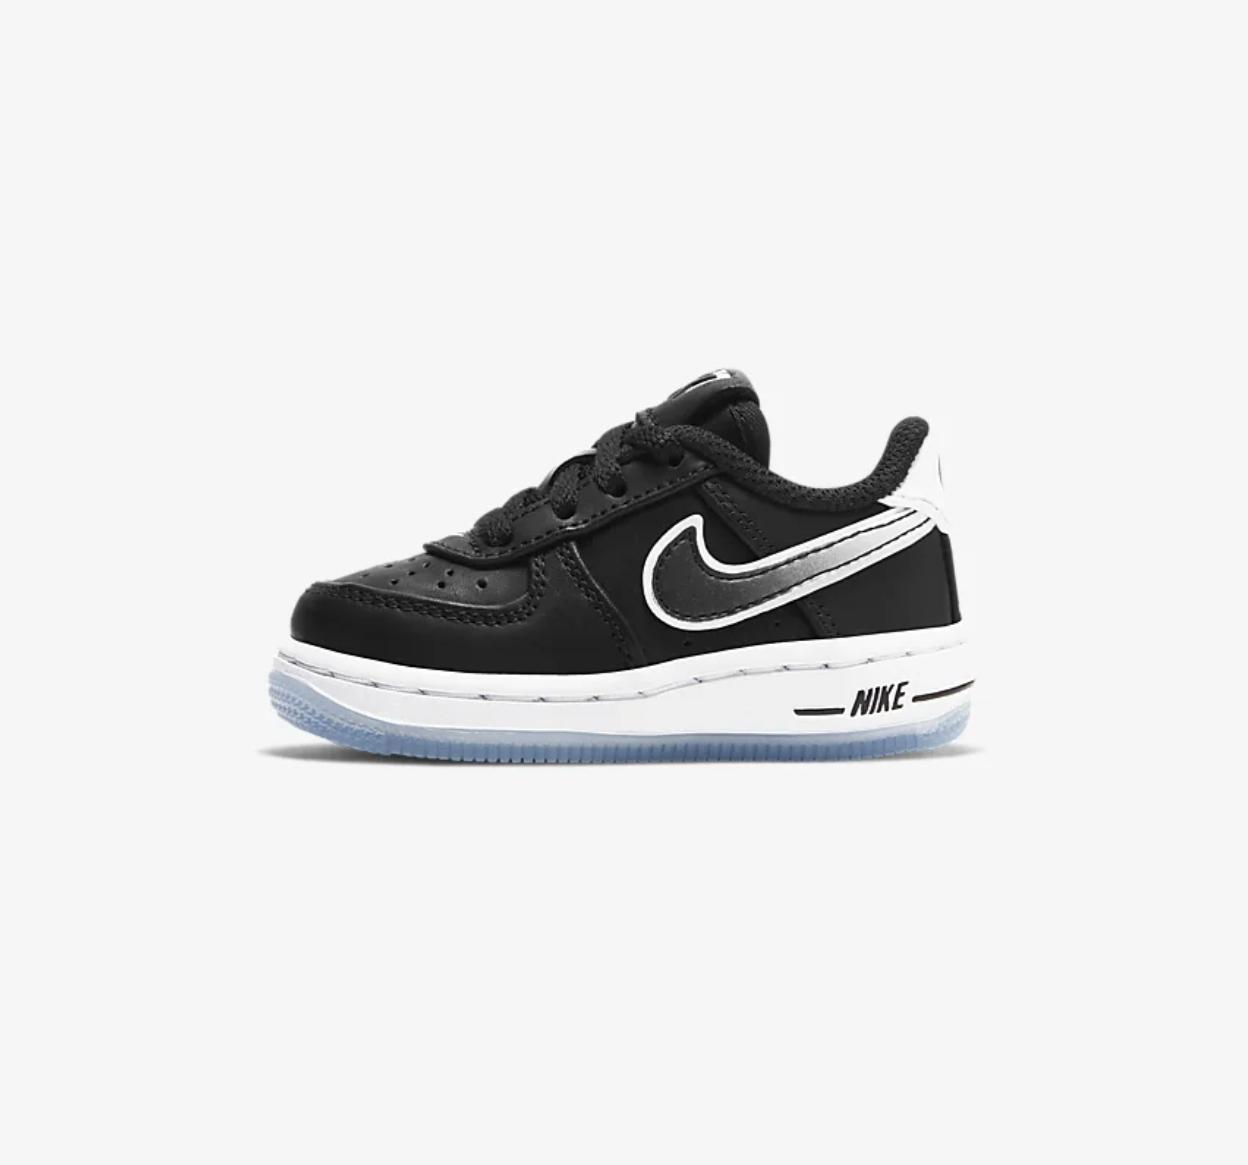 Nike Air Force 1 '07 x Colin Kaepernick baby/toddler shoe